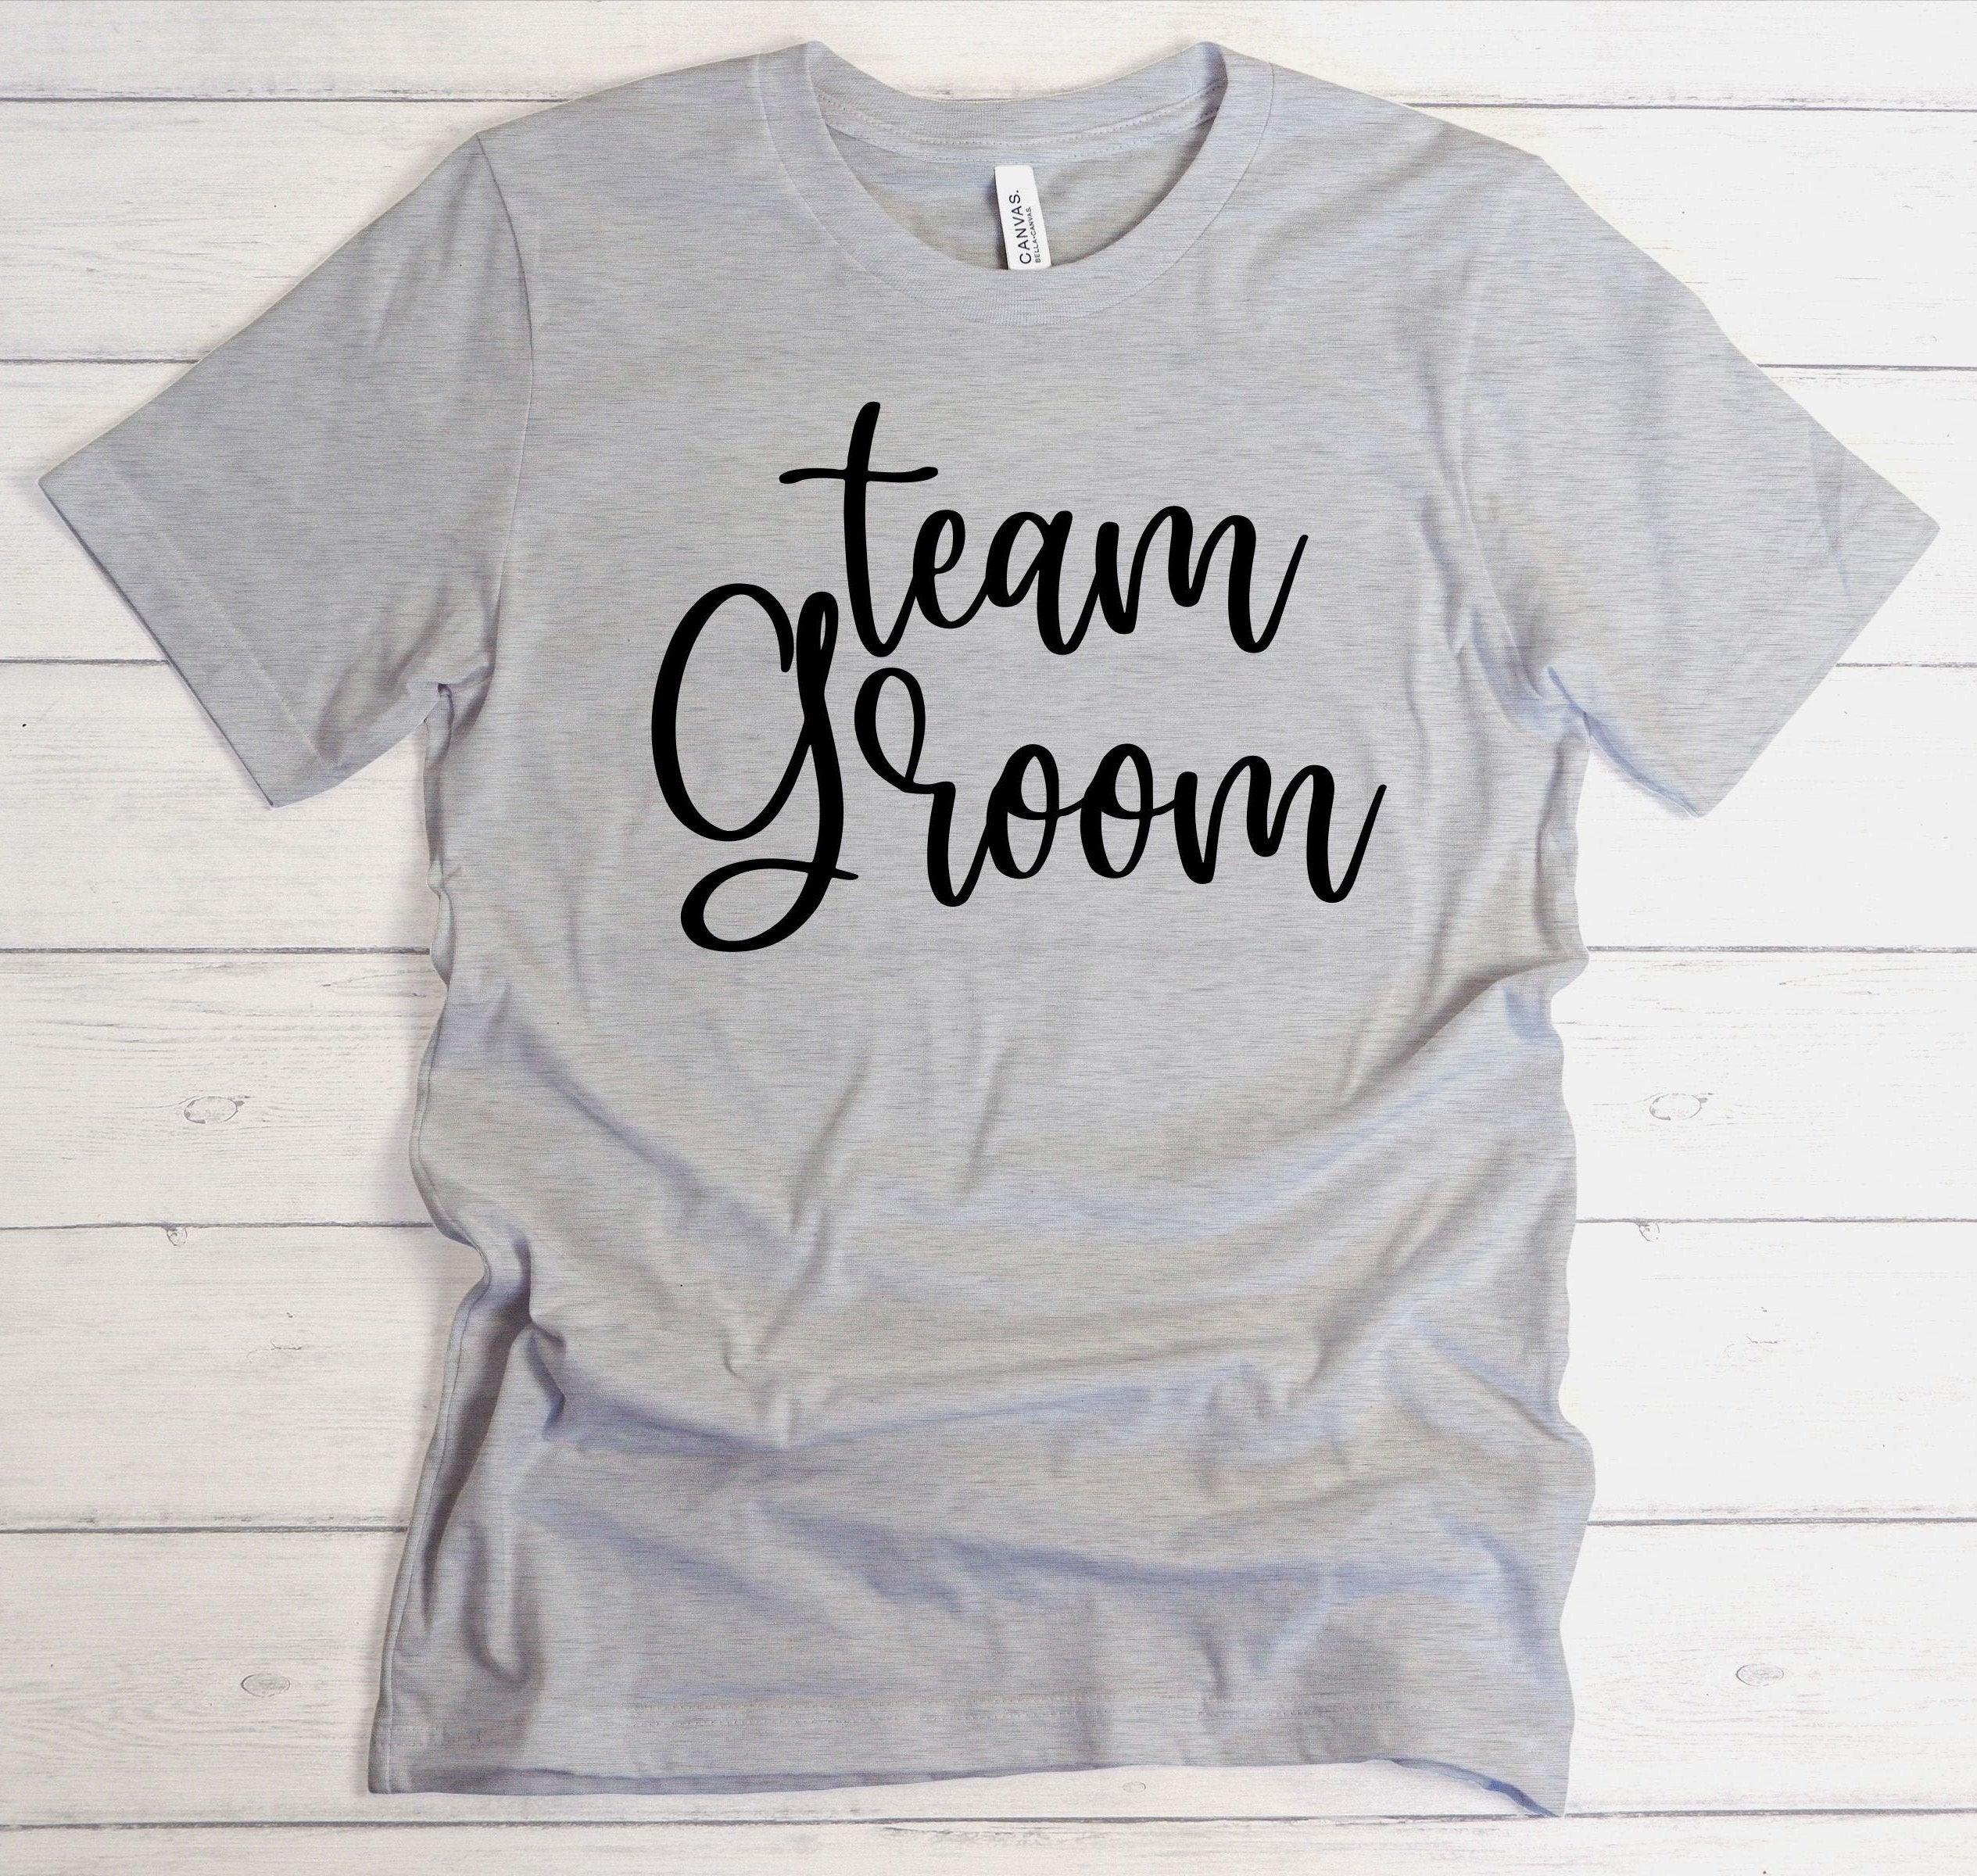 Team-groom-svg-groomsmen-svg-bride-svg-bachelor-party-svg-bride-svg-wedding-svg-design-bachelorette-svg-design-bridesmaid-cricut-svg-2-600a1719